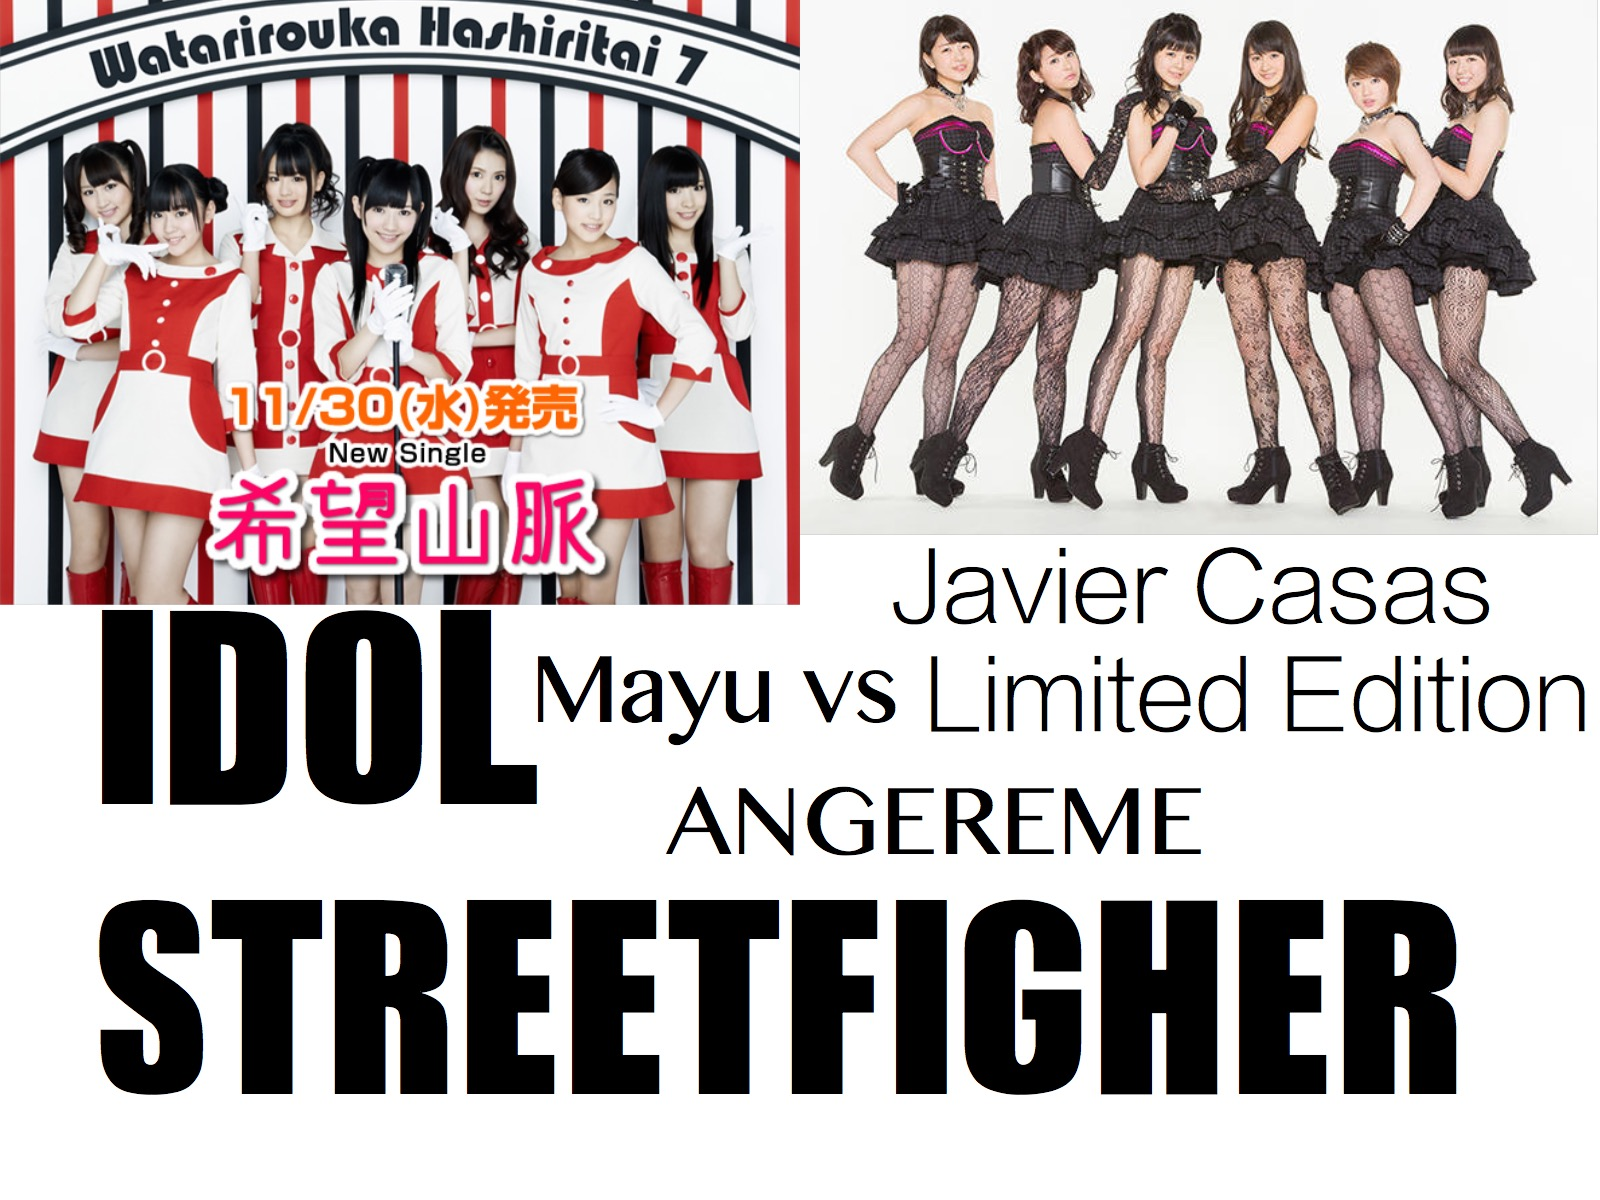 Streetfighter ANGEREME aka S/mileage vs. Watanabe Mayu AKB48 JPOP KPOP Watarirouka Hashiritai 7 - Special Part 1